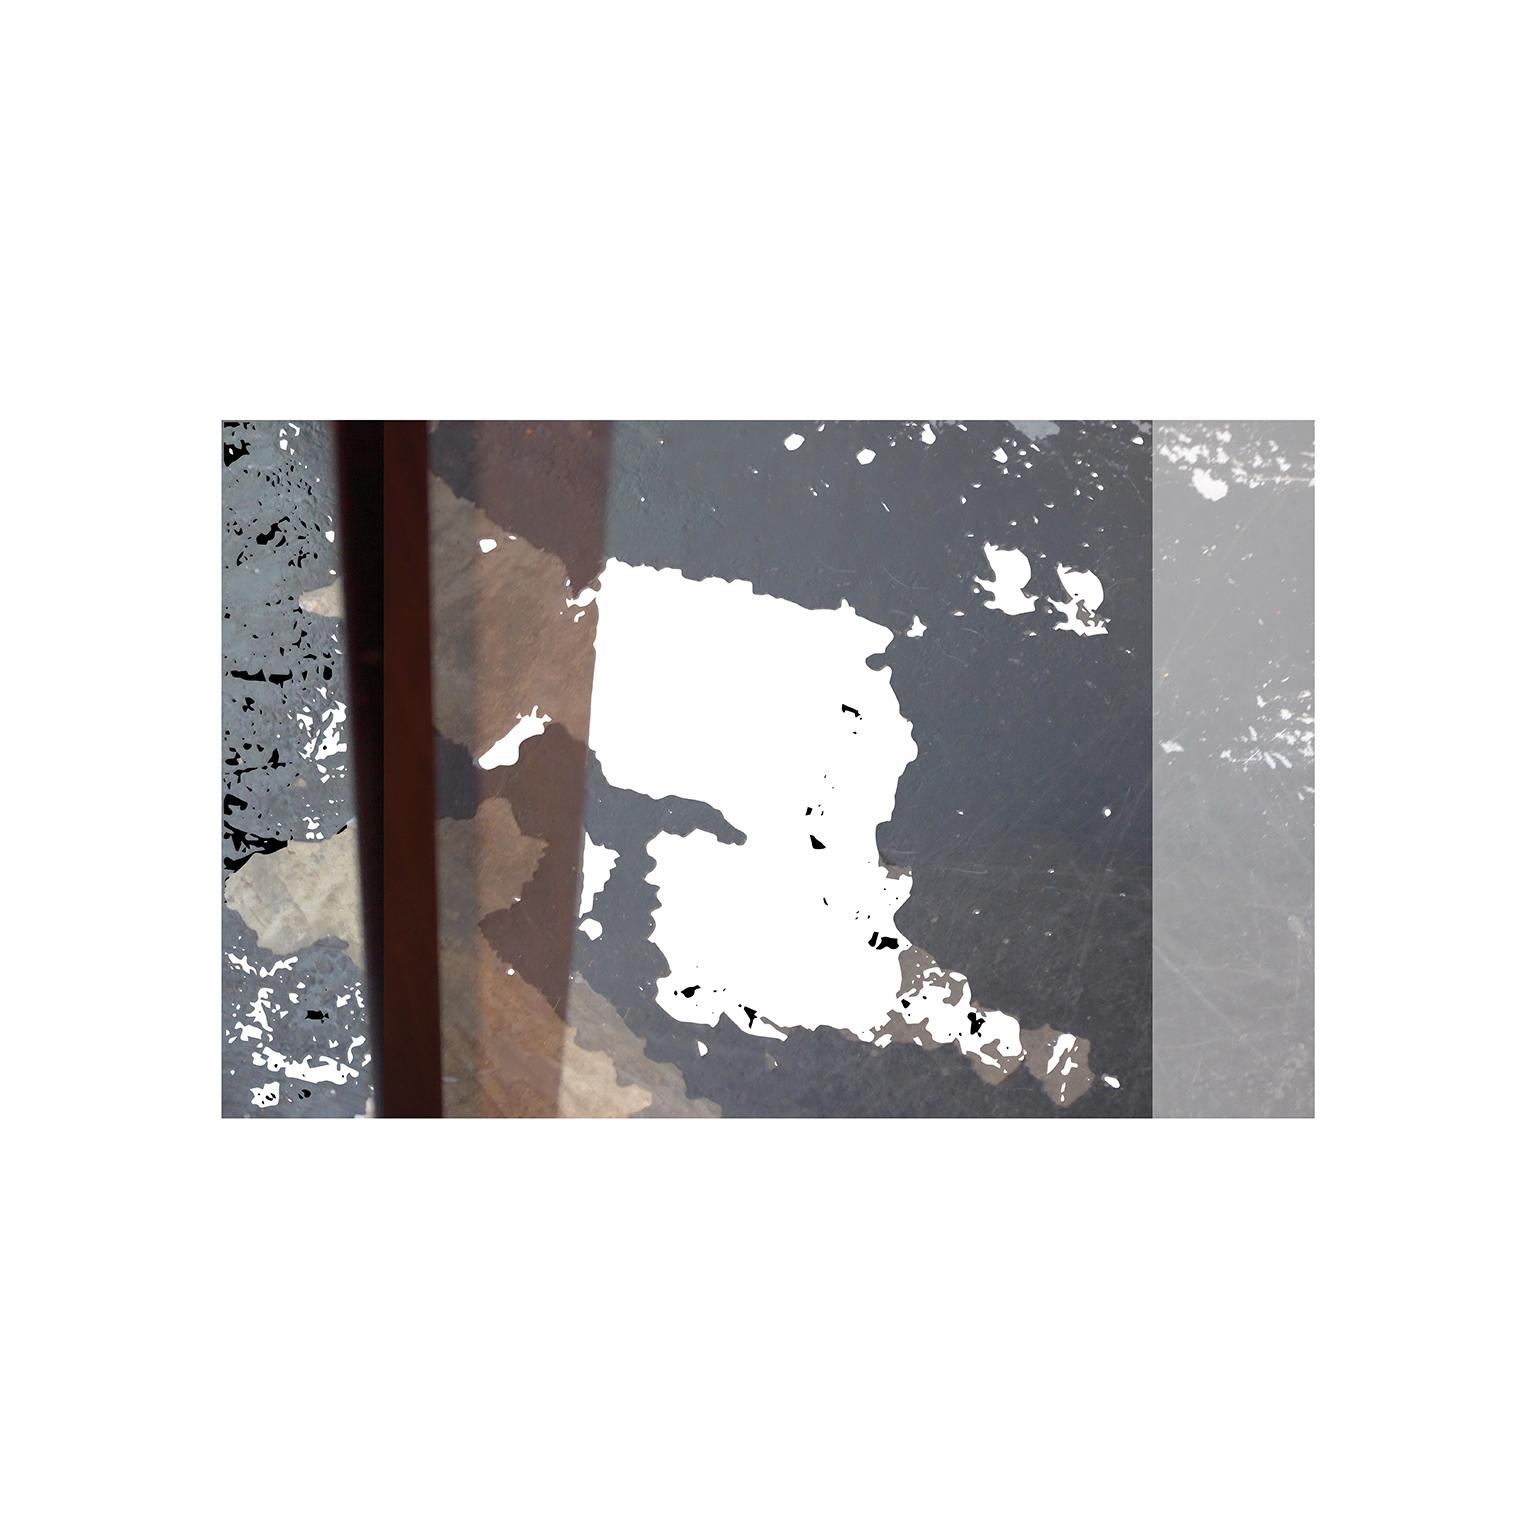 plancher-patte-2b